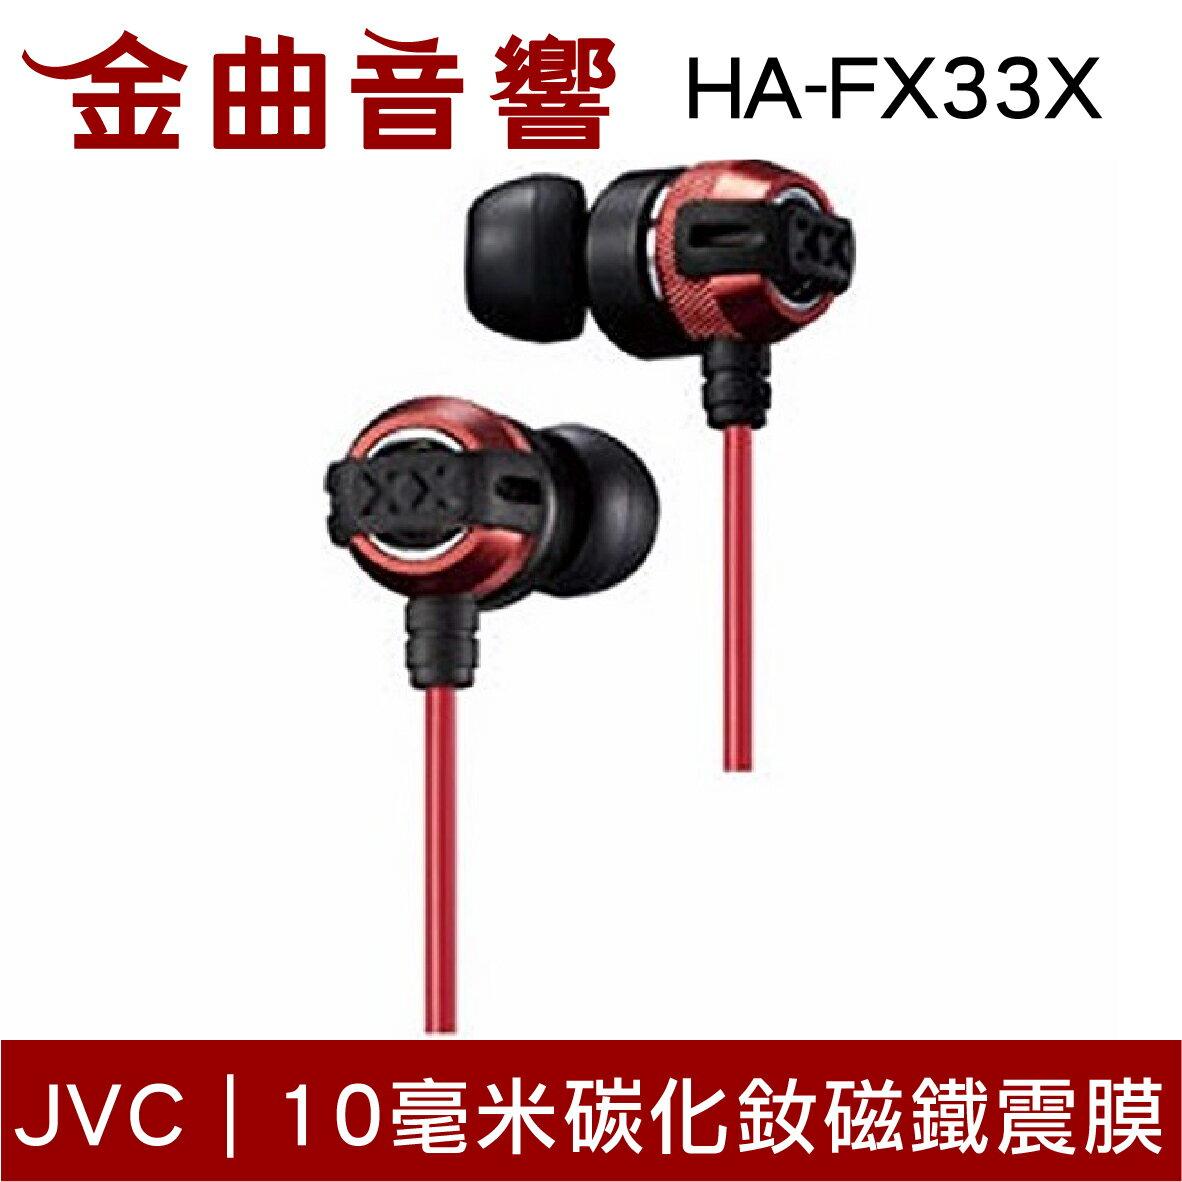 JVC 超重低音系列 HA-FX33X 紅 噪音隔離 耳道式耳機 | 金曲音響